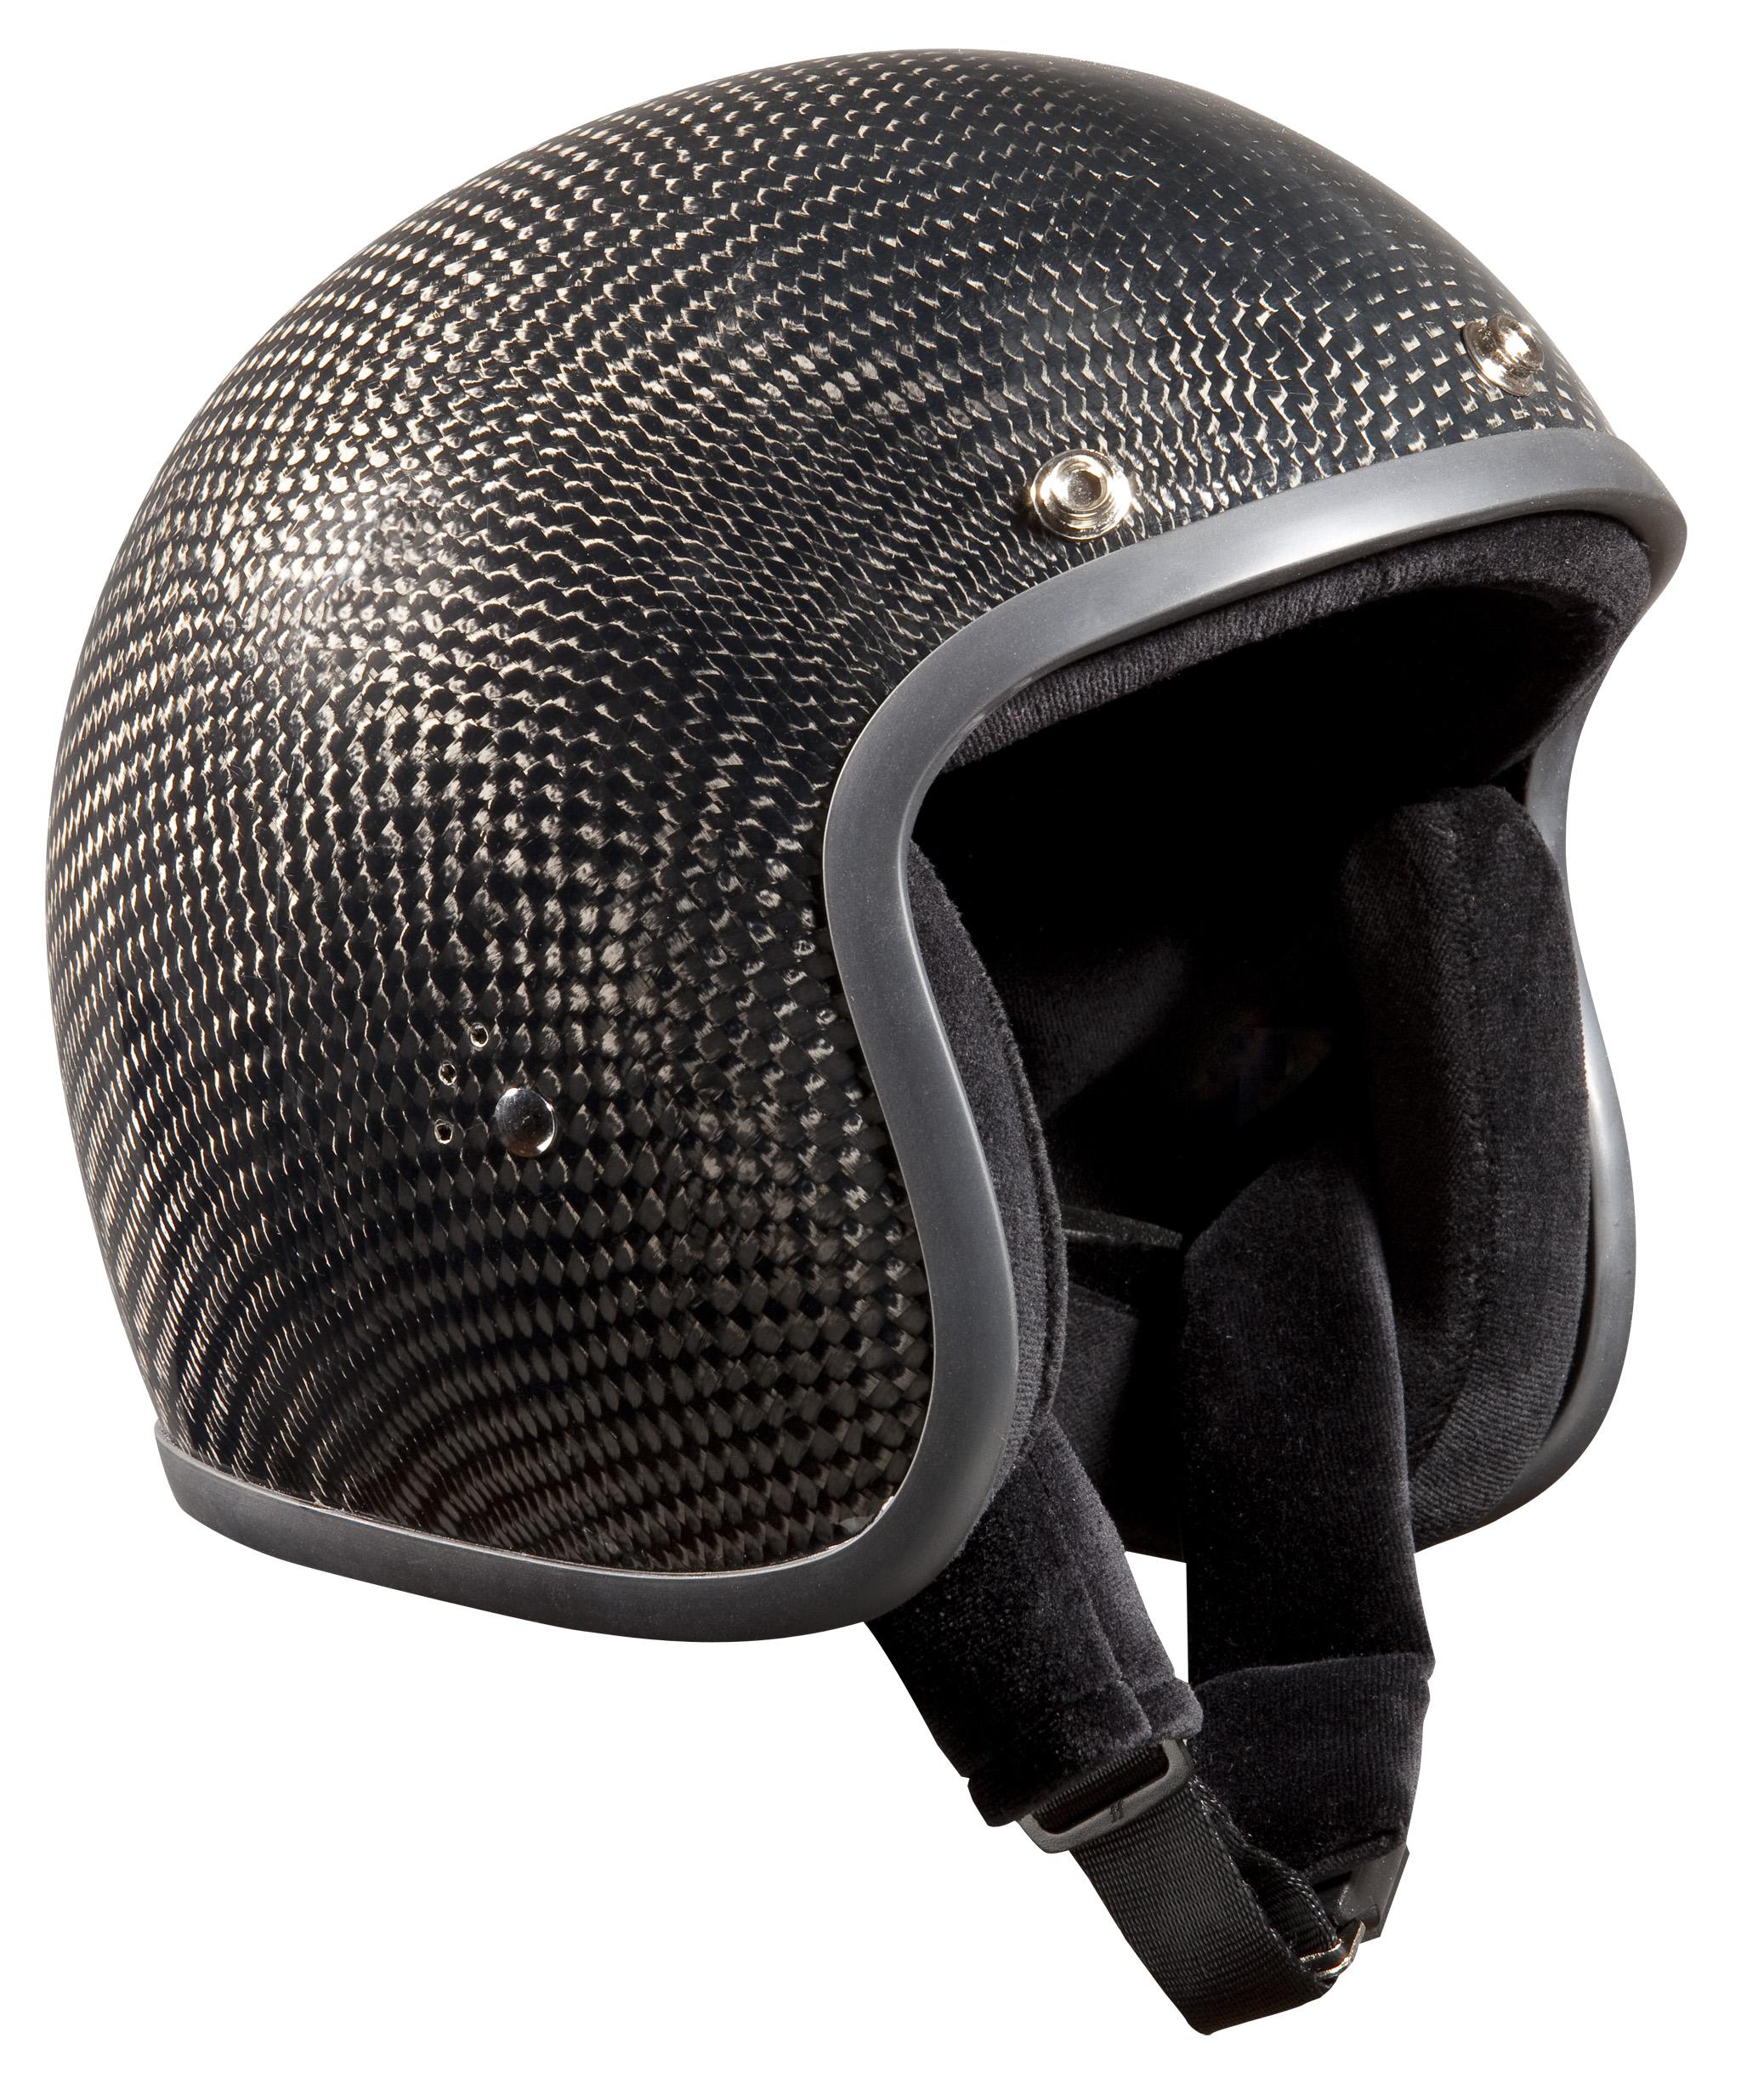 bandit helmets jet carbon buy online